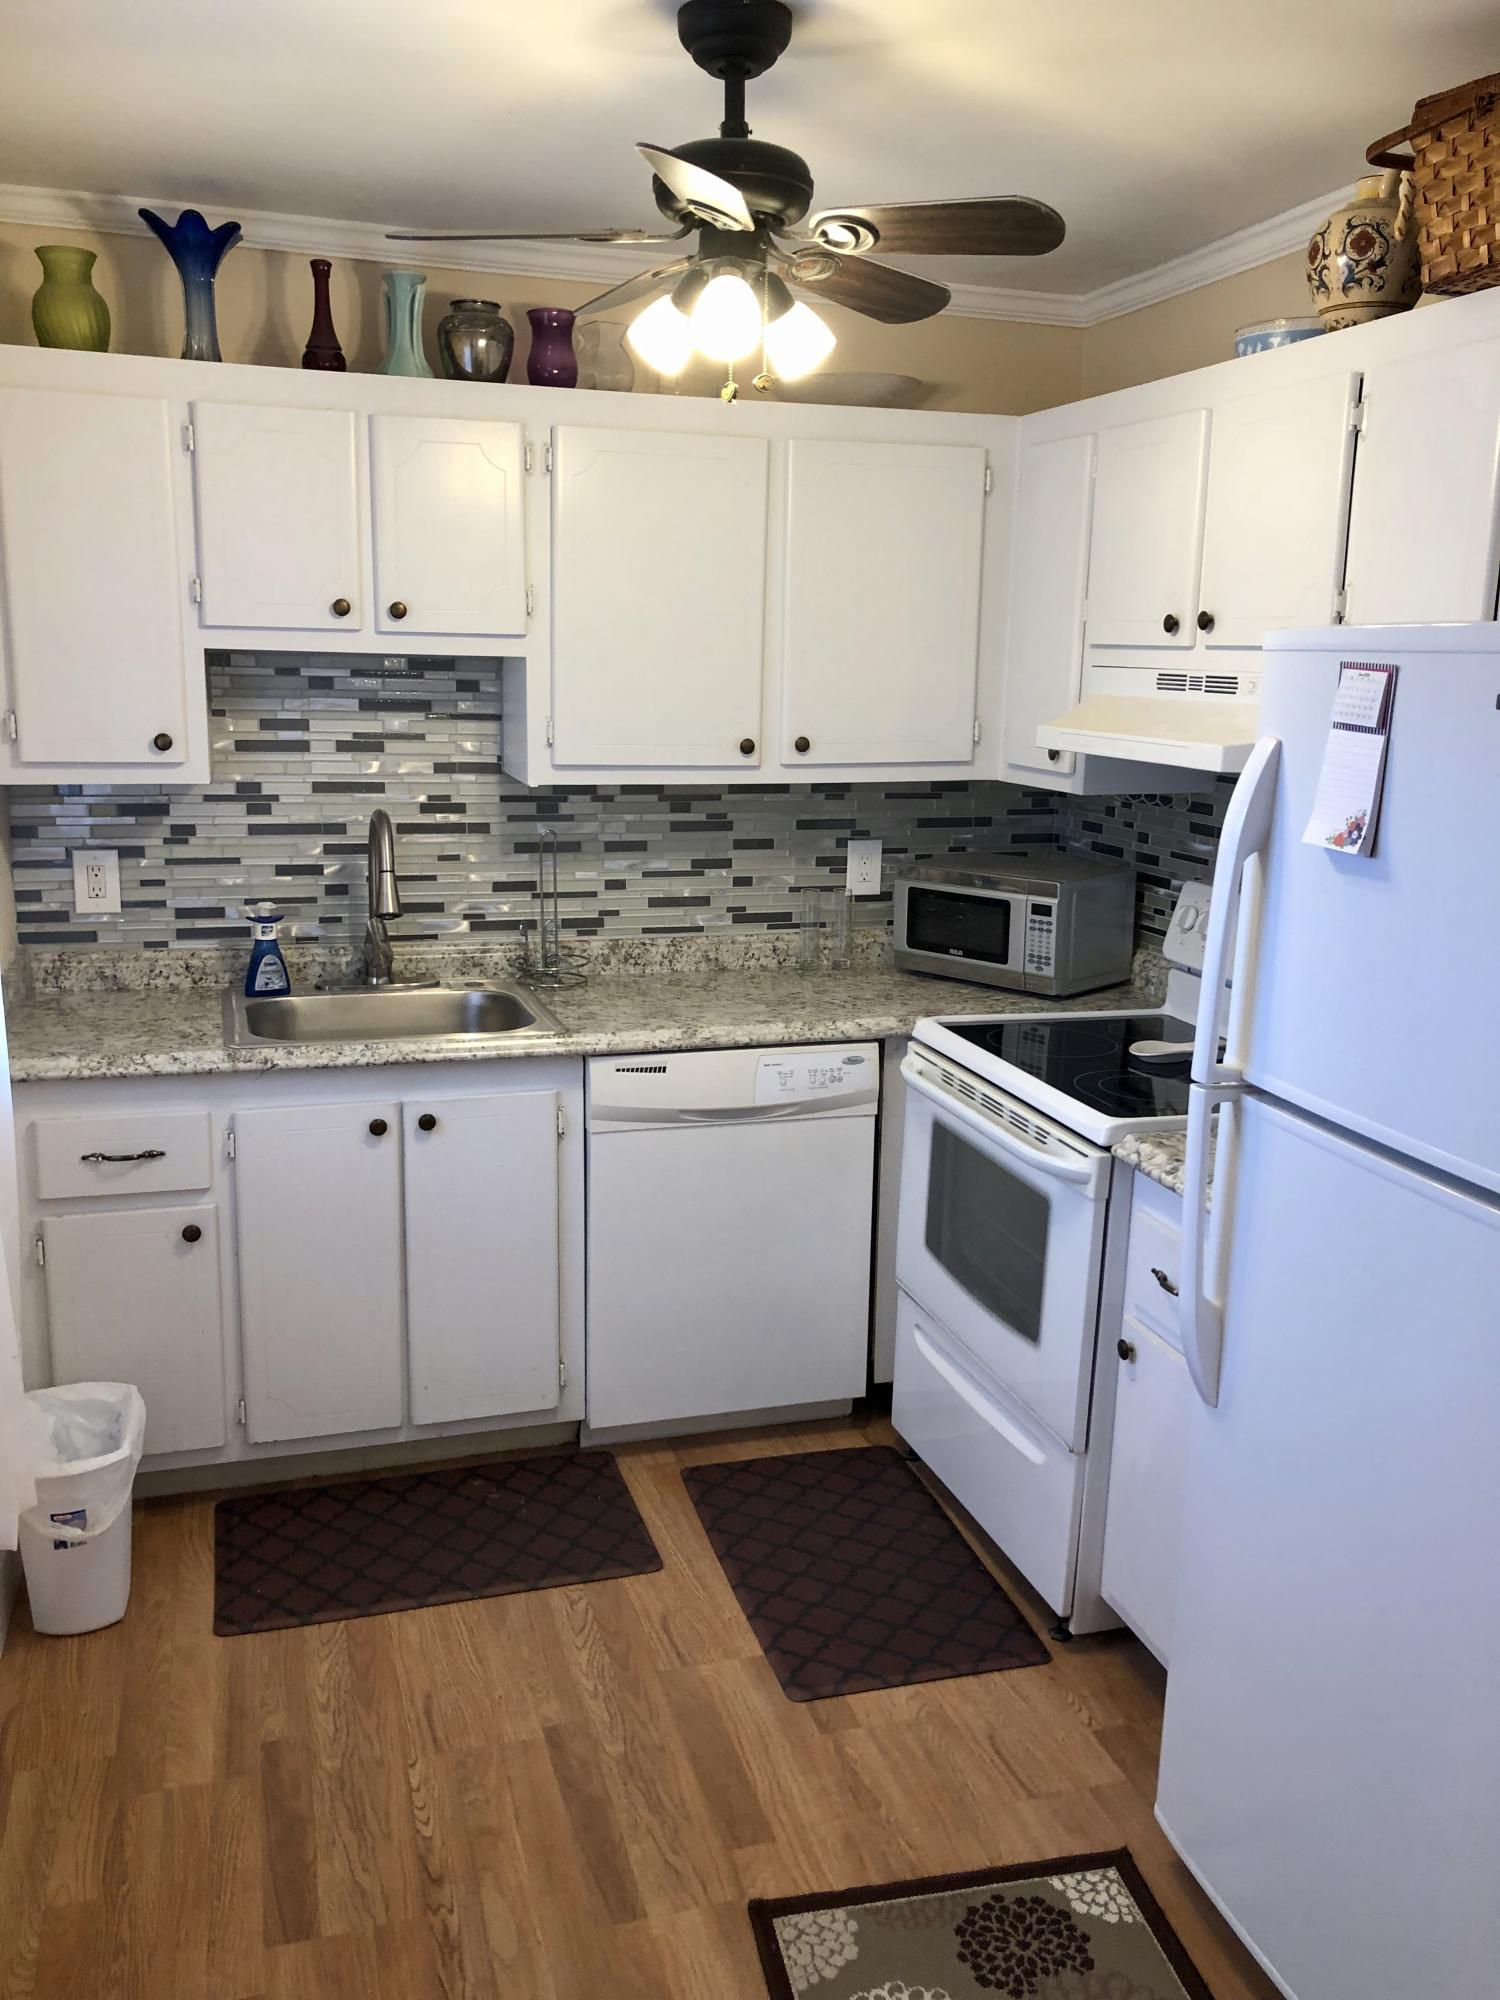 465 Saxony J, Delray Beach, Florida 33446, 2 Bedrooms Bedrooms, ,2 BathroomsBathrooms,Condo/Coop,For Sale,Kings Point,Saxony J,2,RX-10474647